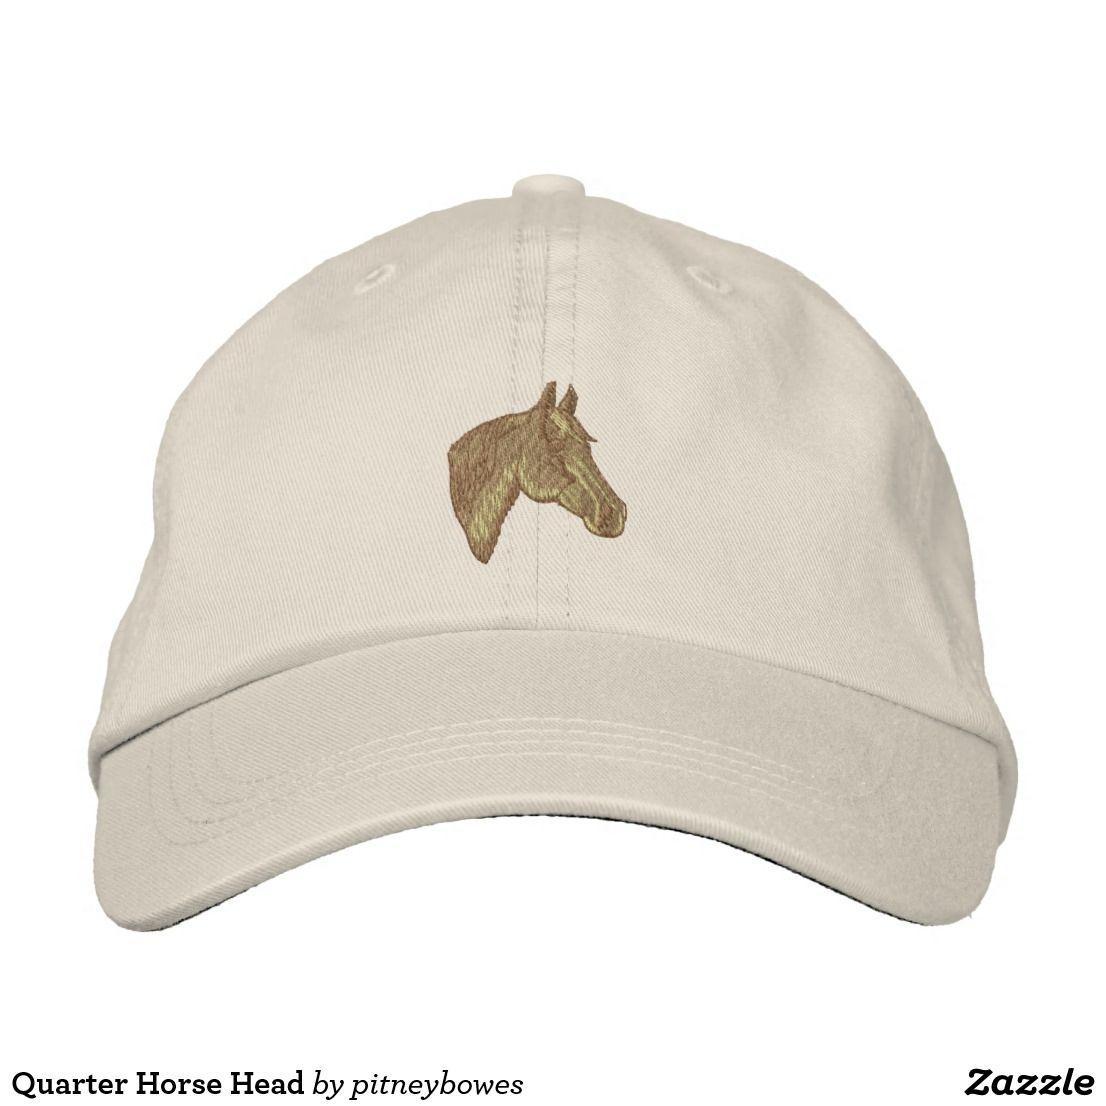 73e33272bfac6 Quarter Horse Head Embroidered Baseball Cap